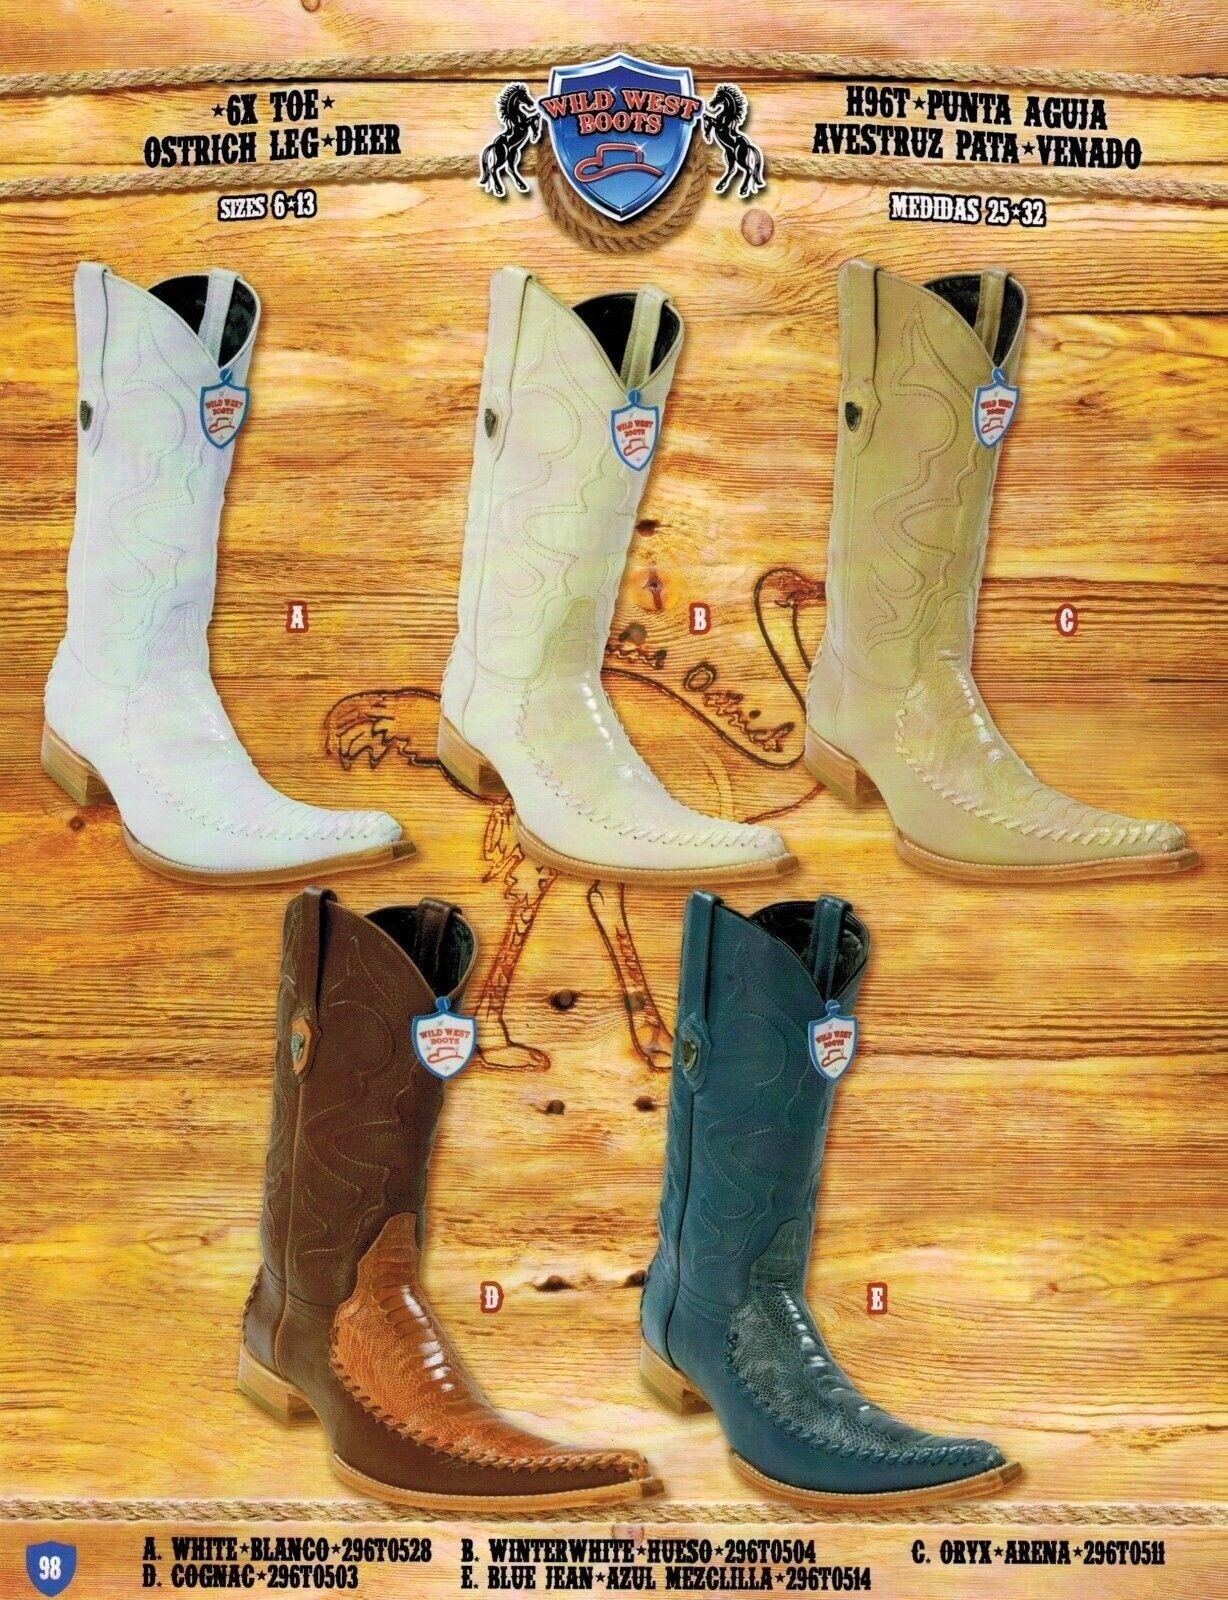 Wild West Men's 6X-Toe Ostrich Leg Deer Cowboy Western stivali Diff. Colorees